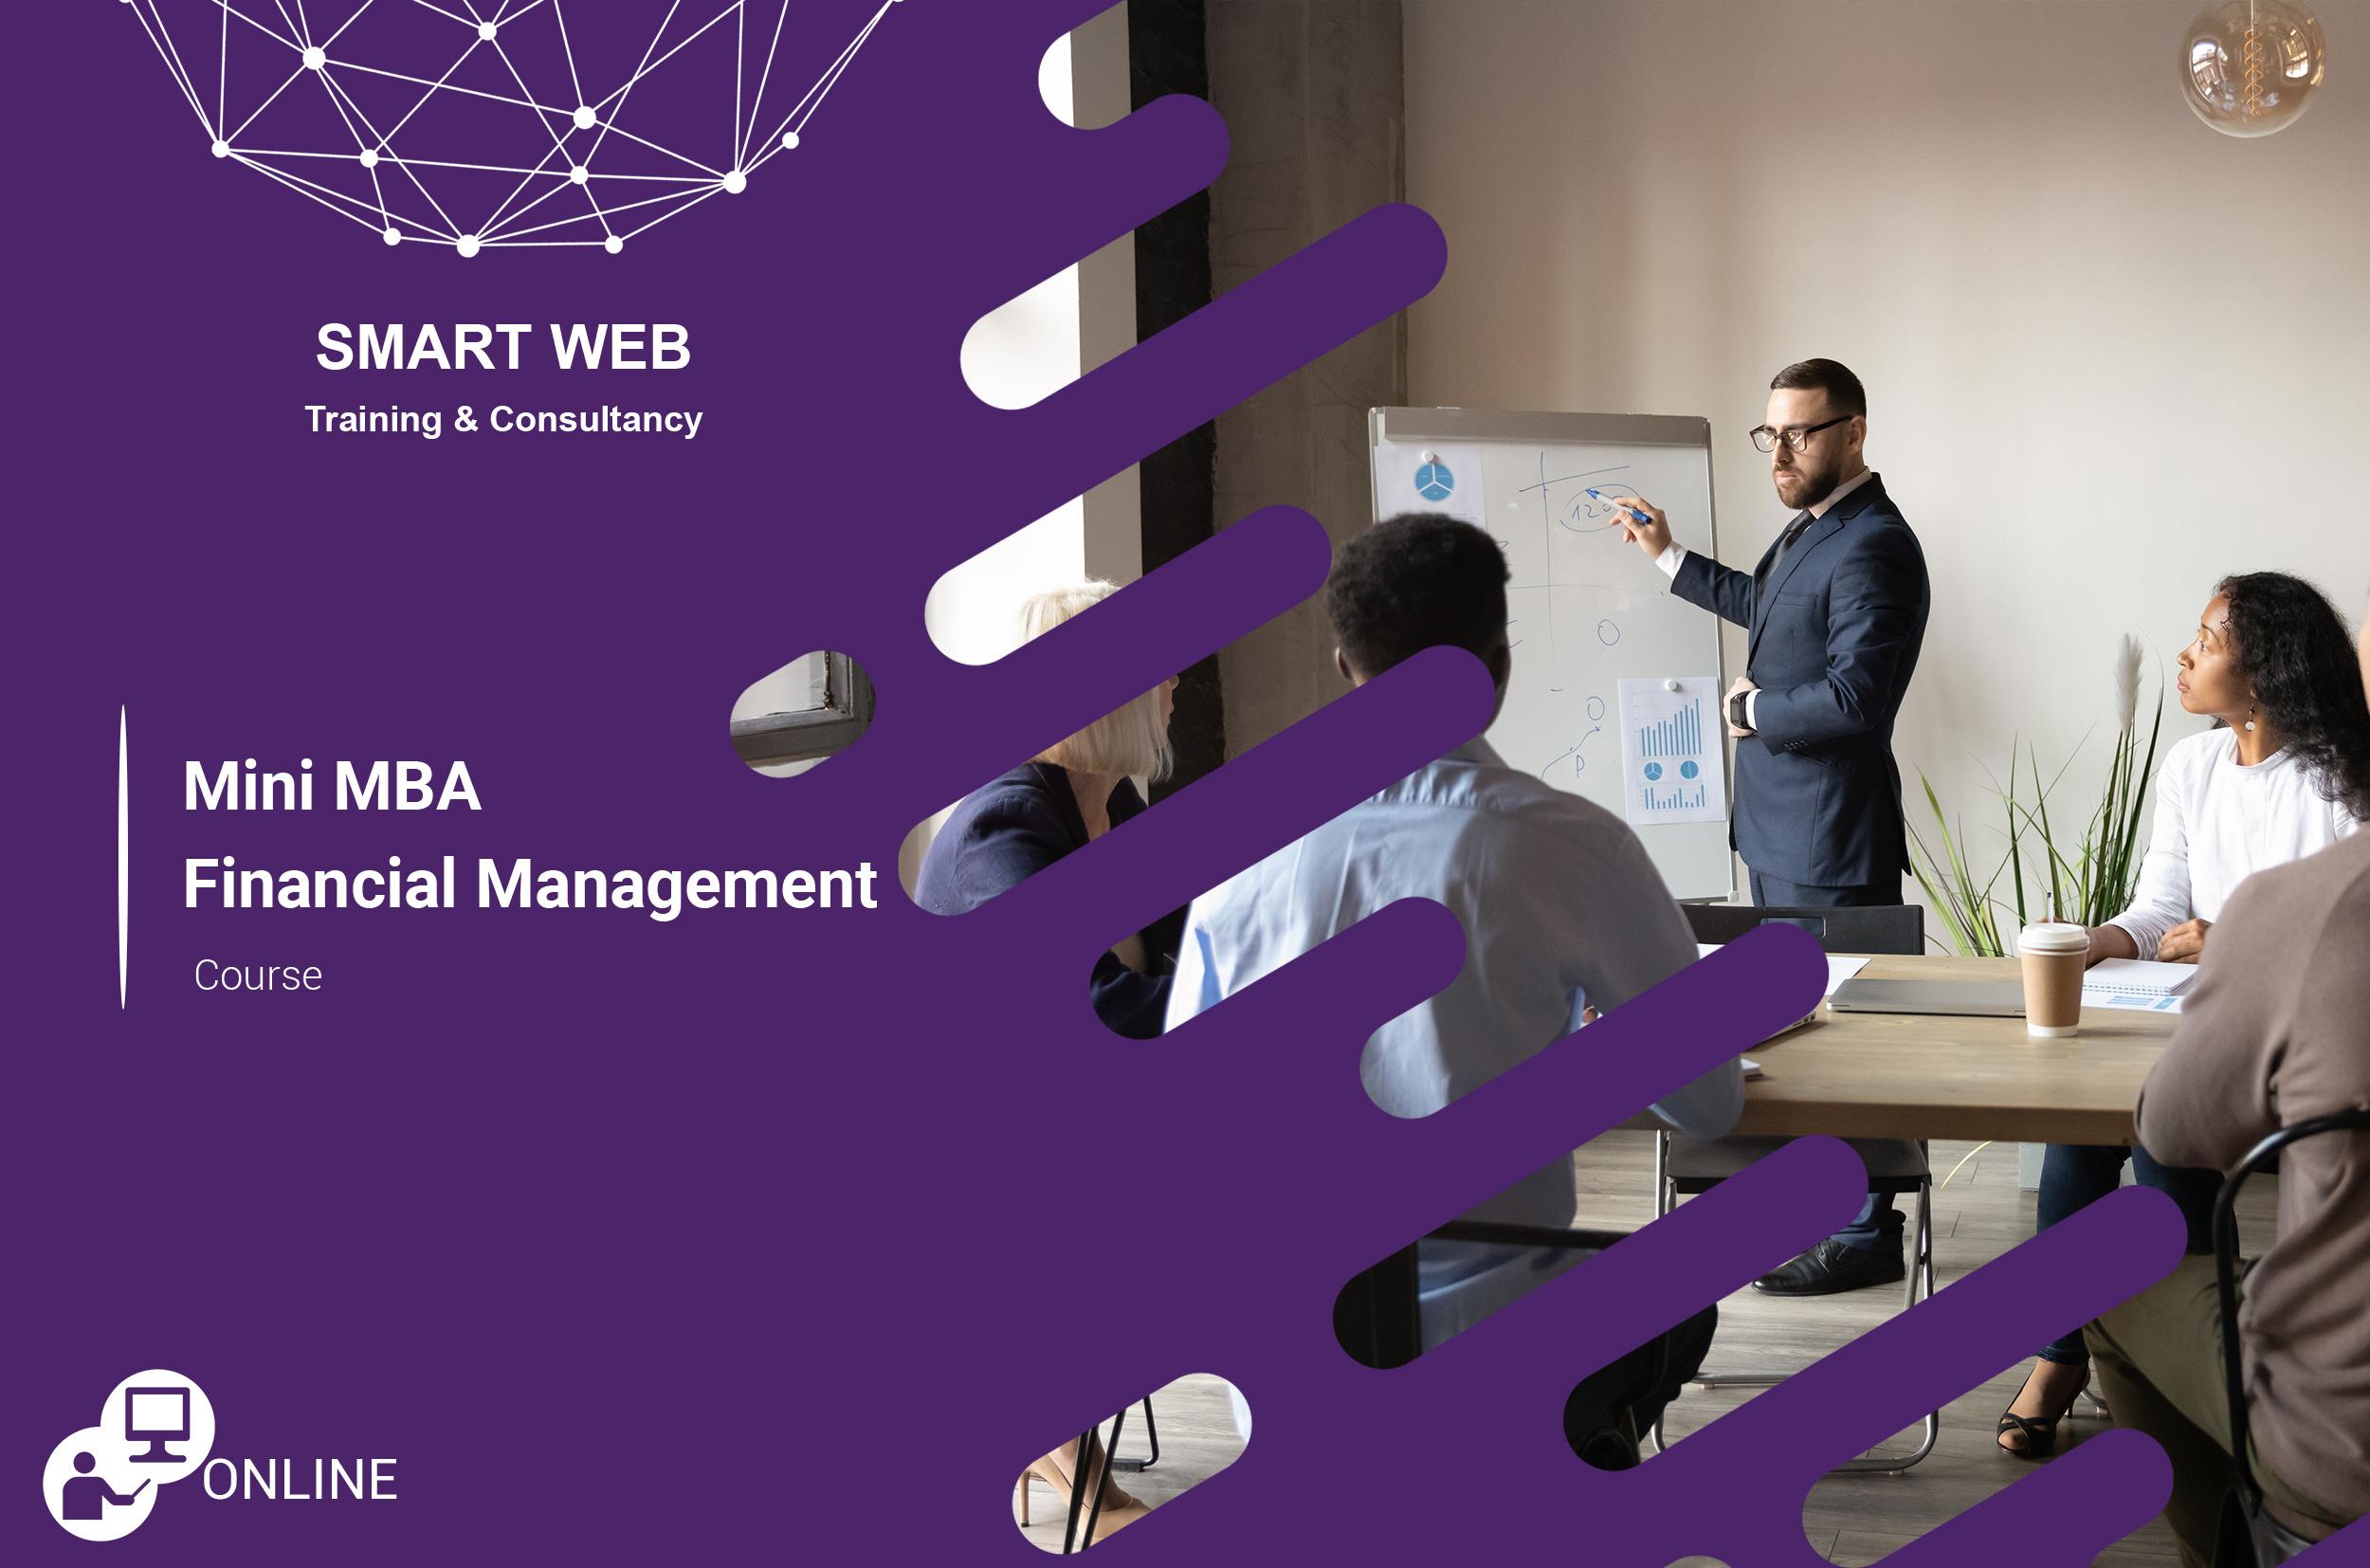 Mini MBA - Financial Management